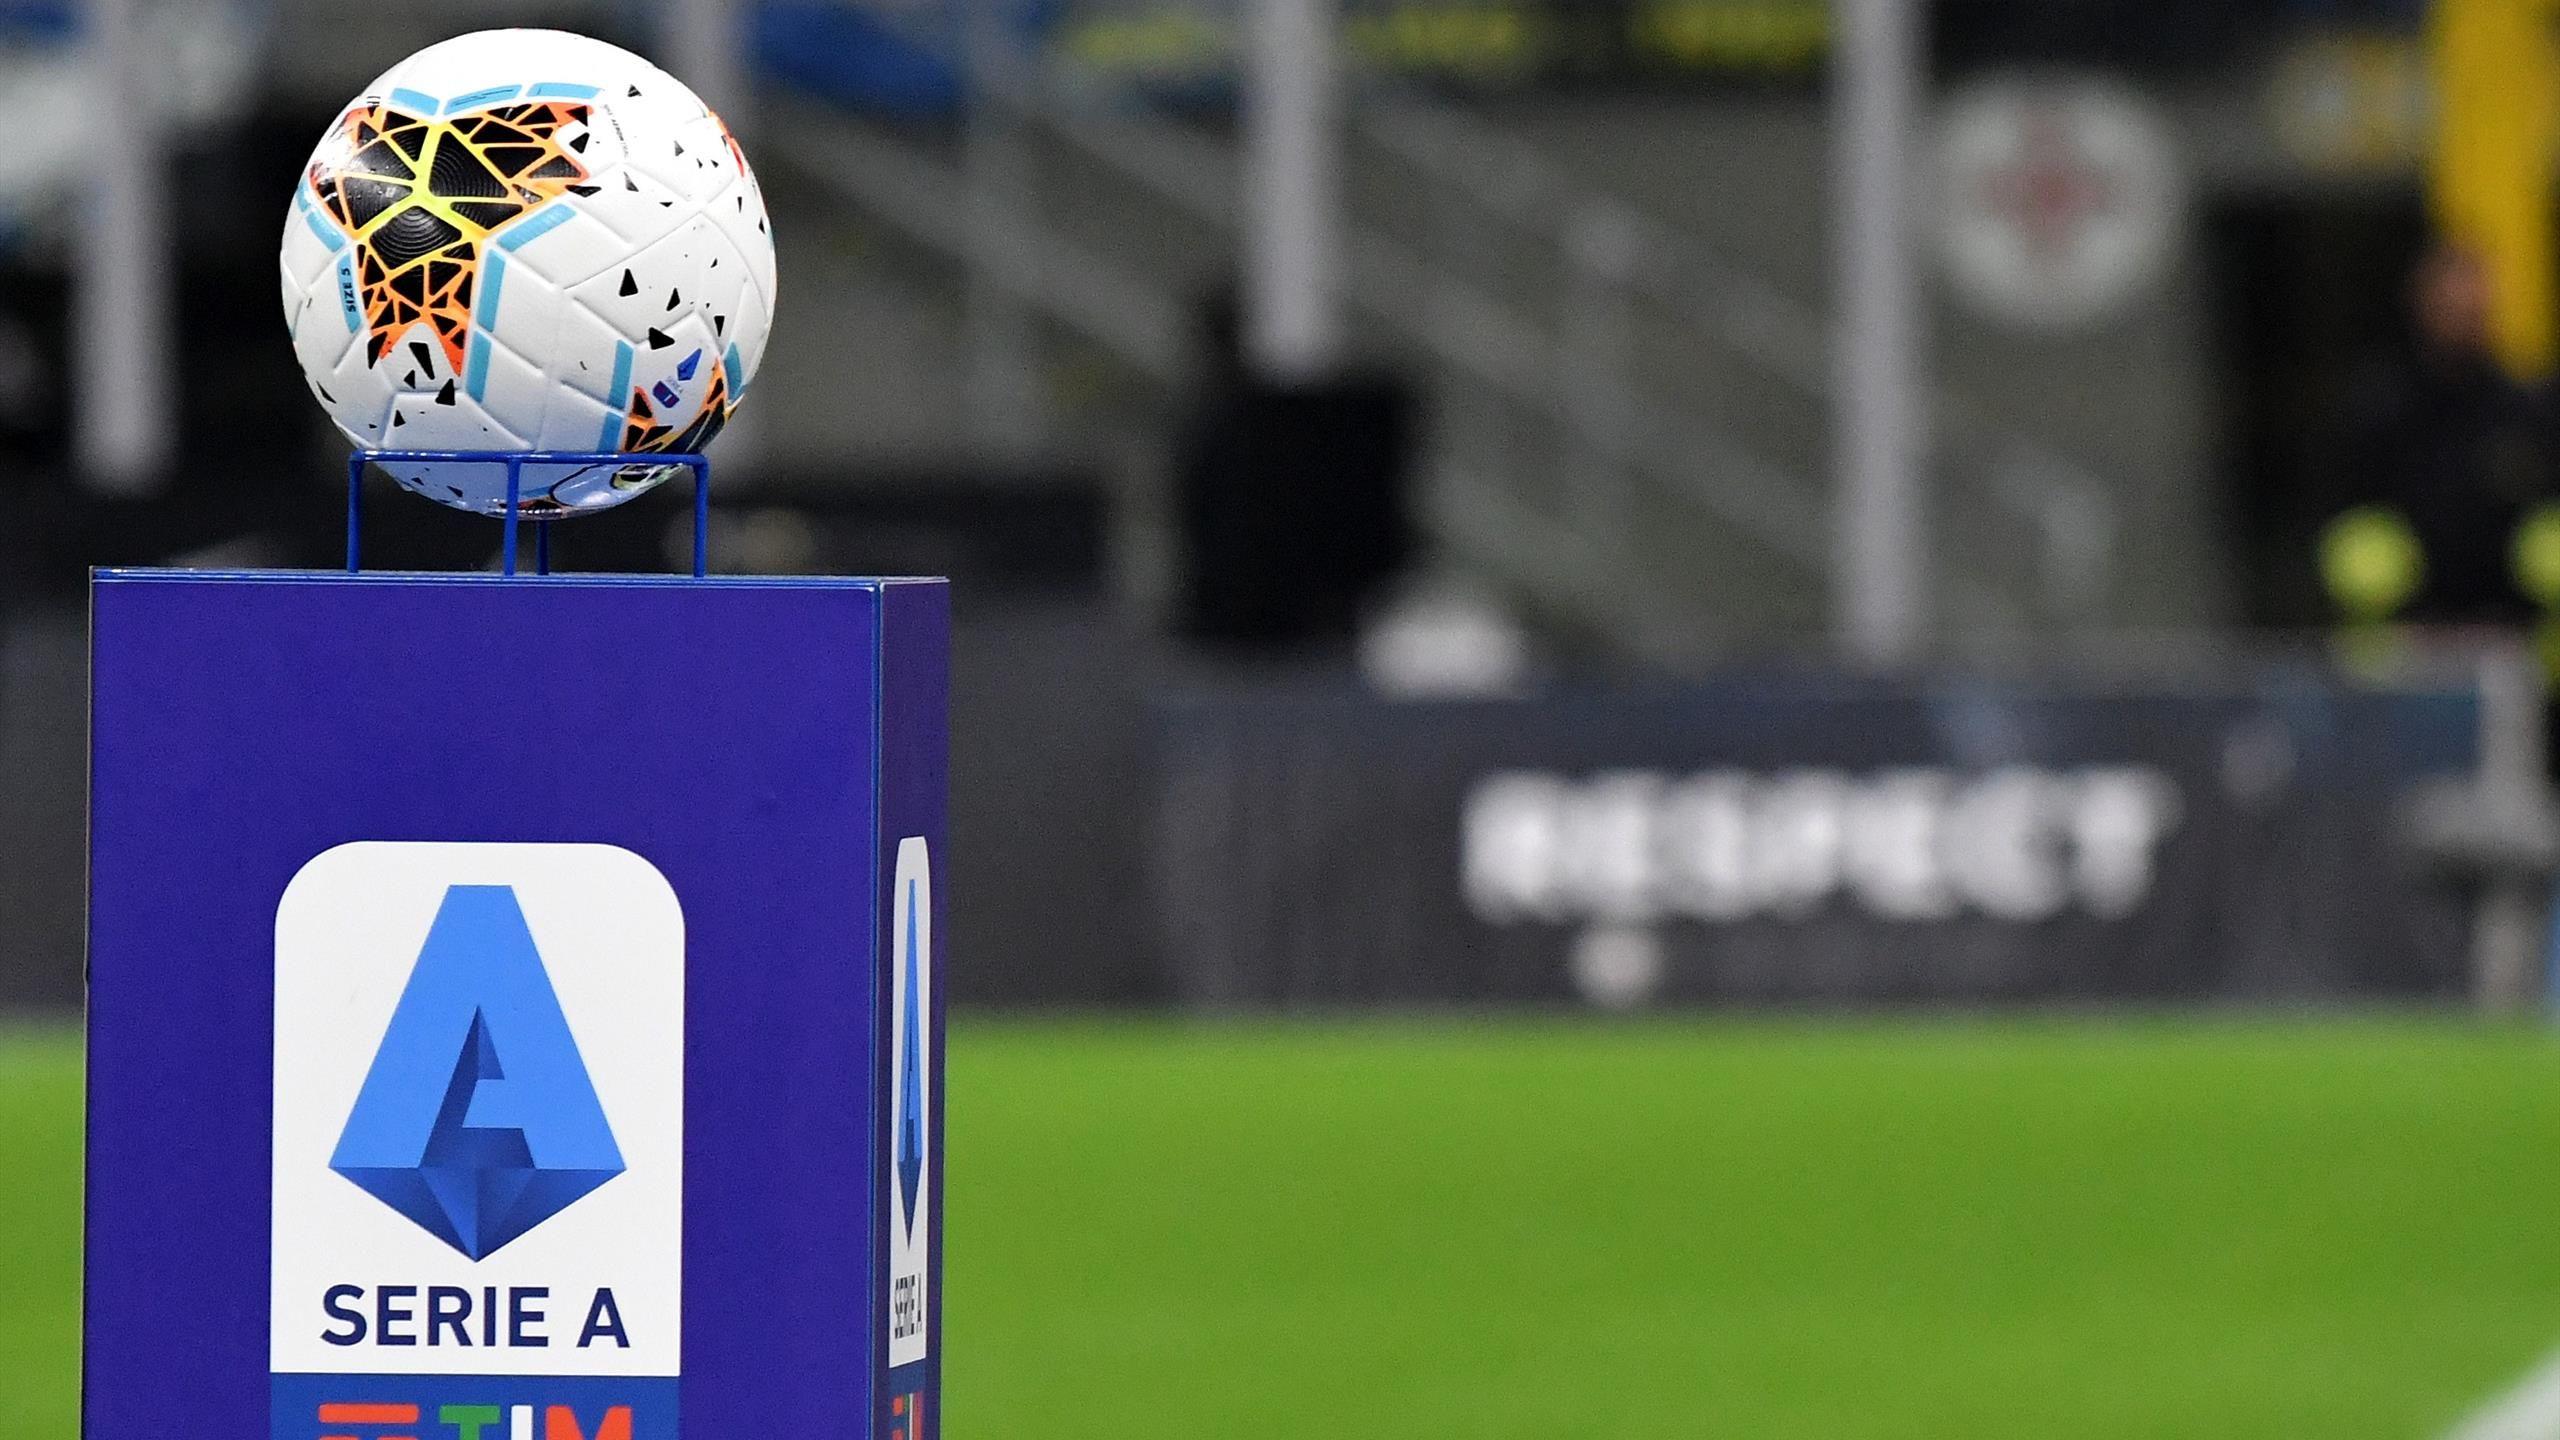 Le championnat italien va reprendre le 20 juin